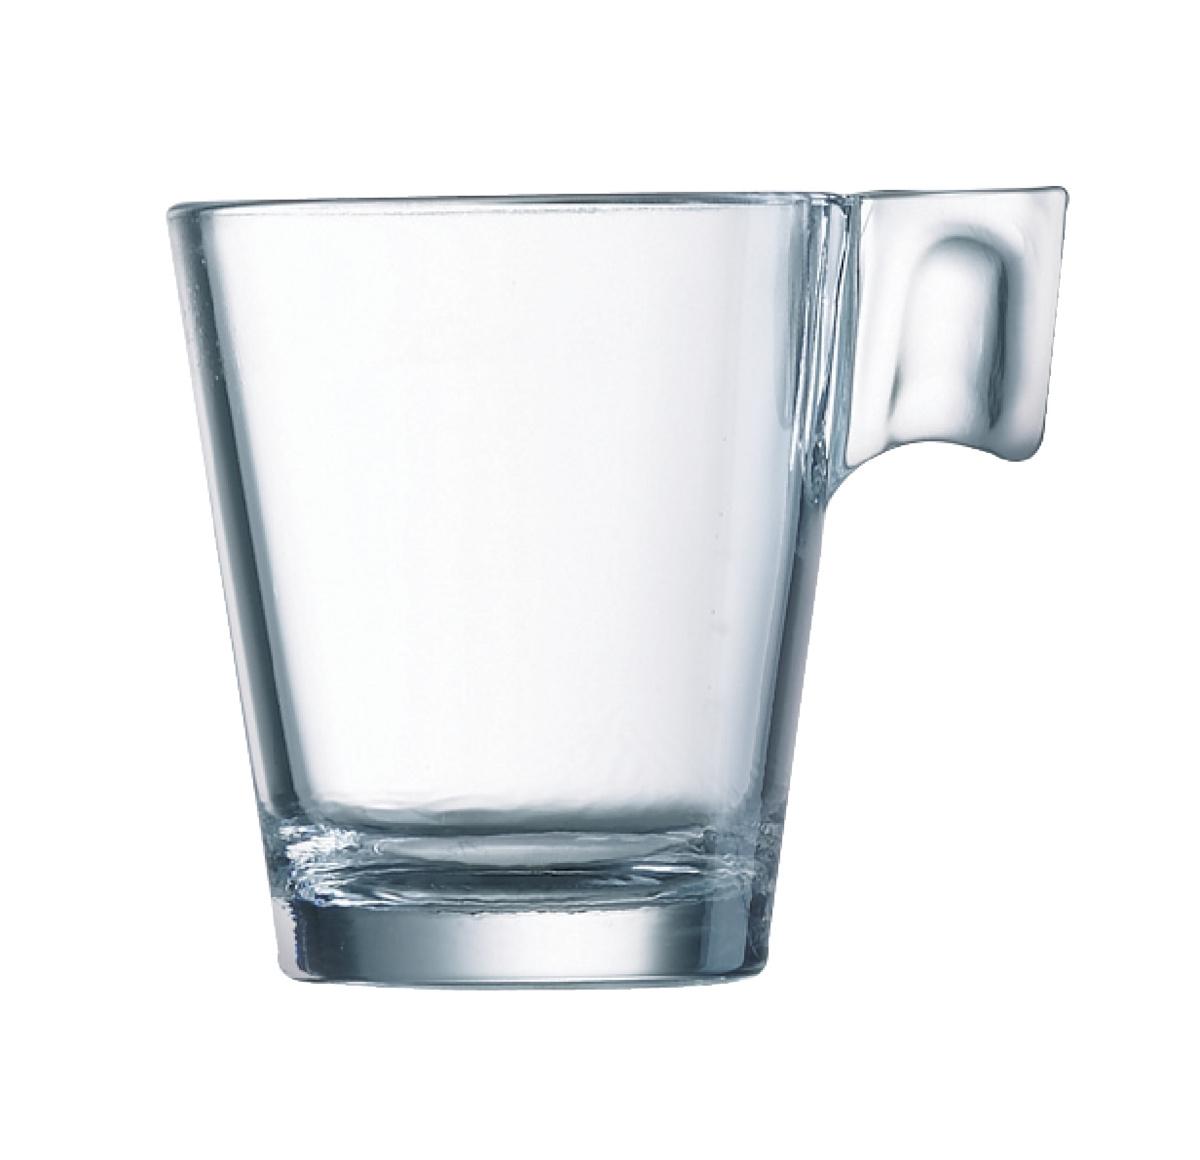 Tasse à café ronde transparente verre 8 cl Ø 7,60 cm Aroma Arcoroc